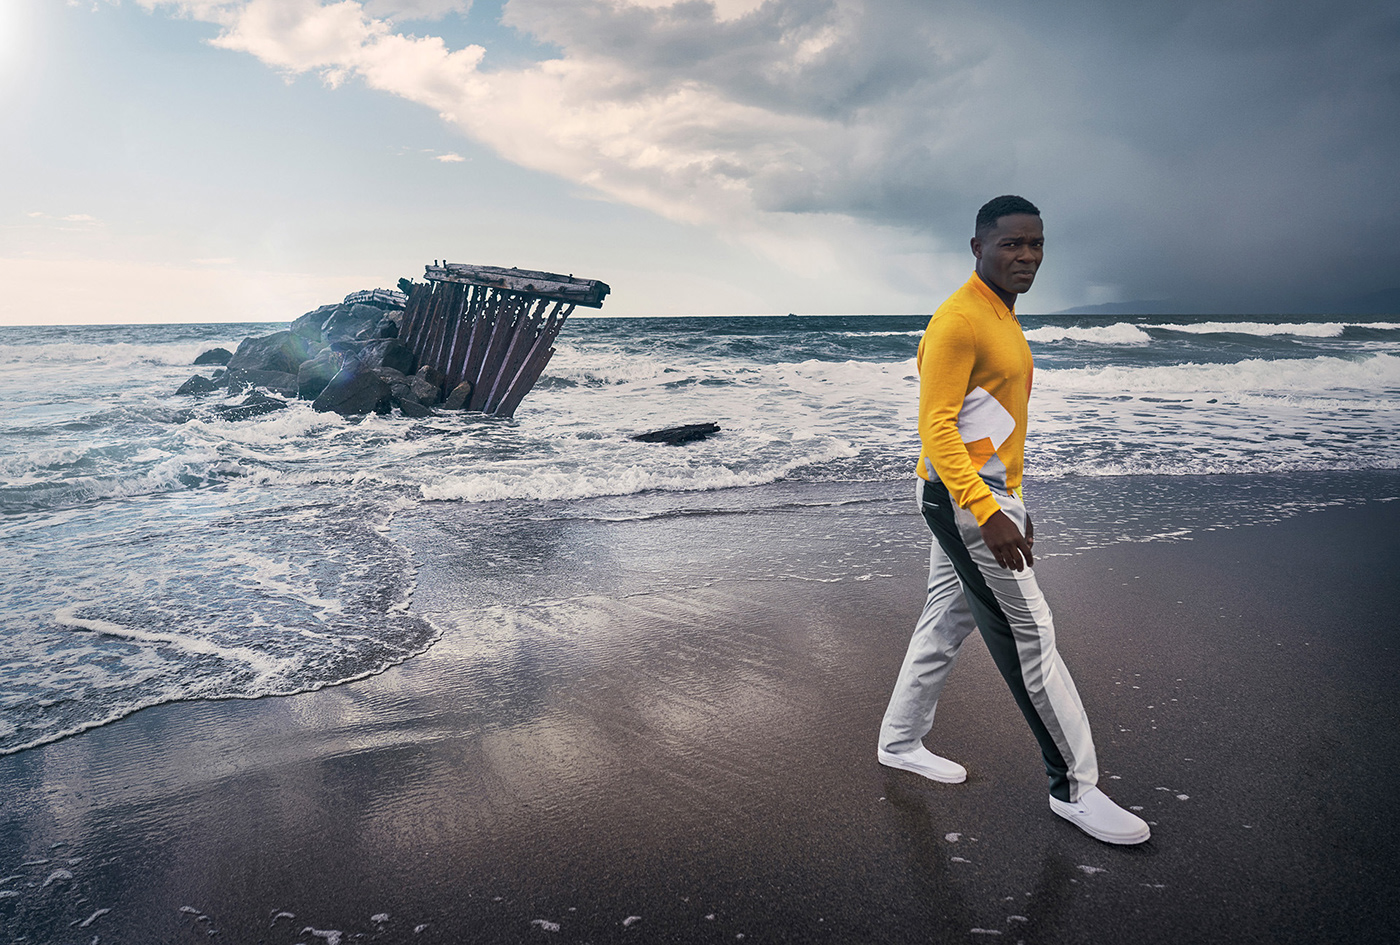 Actor David Oyelowo for Alexa Magazine photographed by the sea.